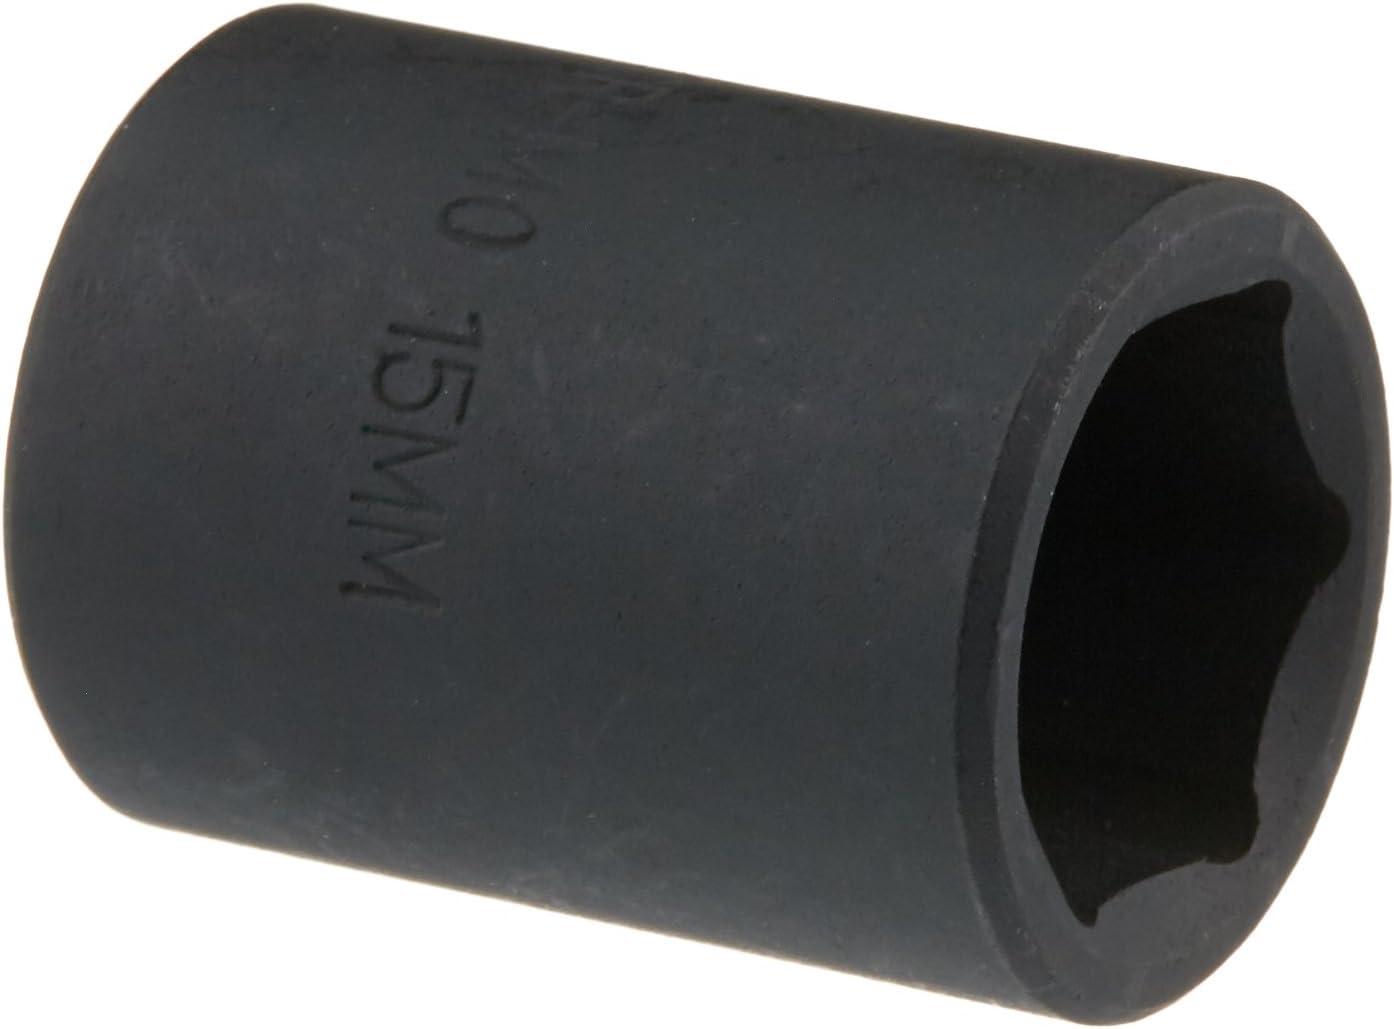 Sunex 315md 3//8-Inch Drive 15-Mm Deep Impact Socket